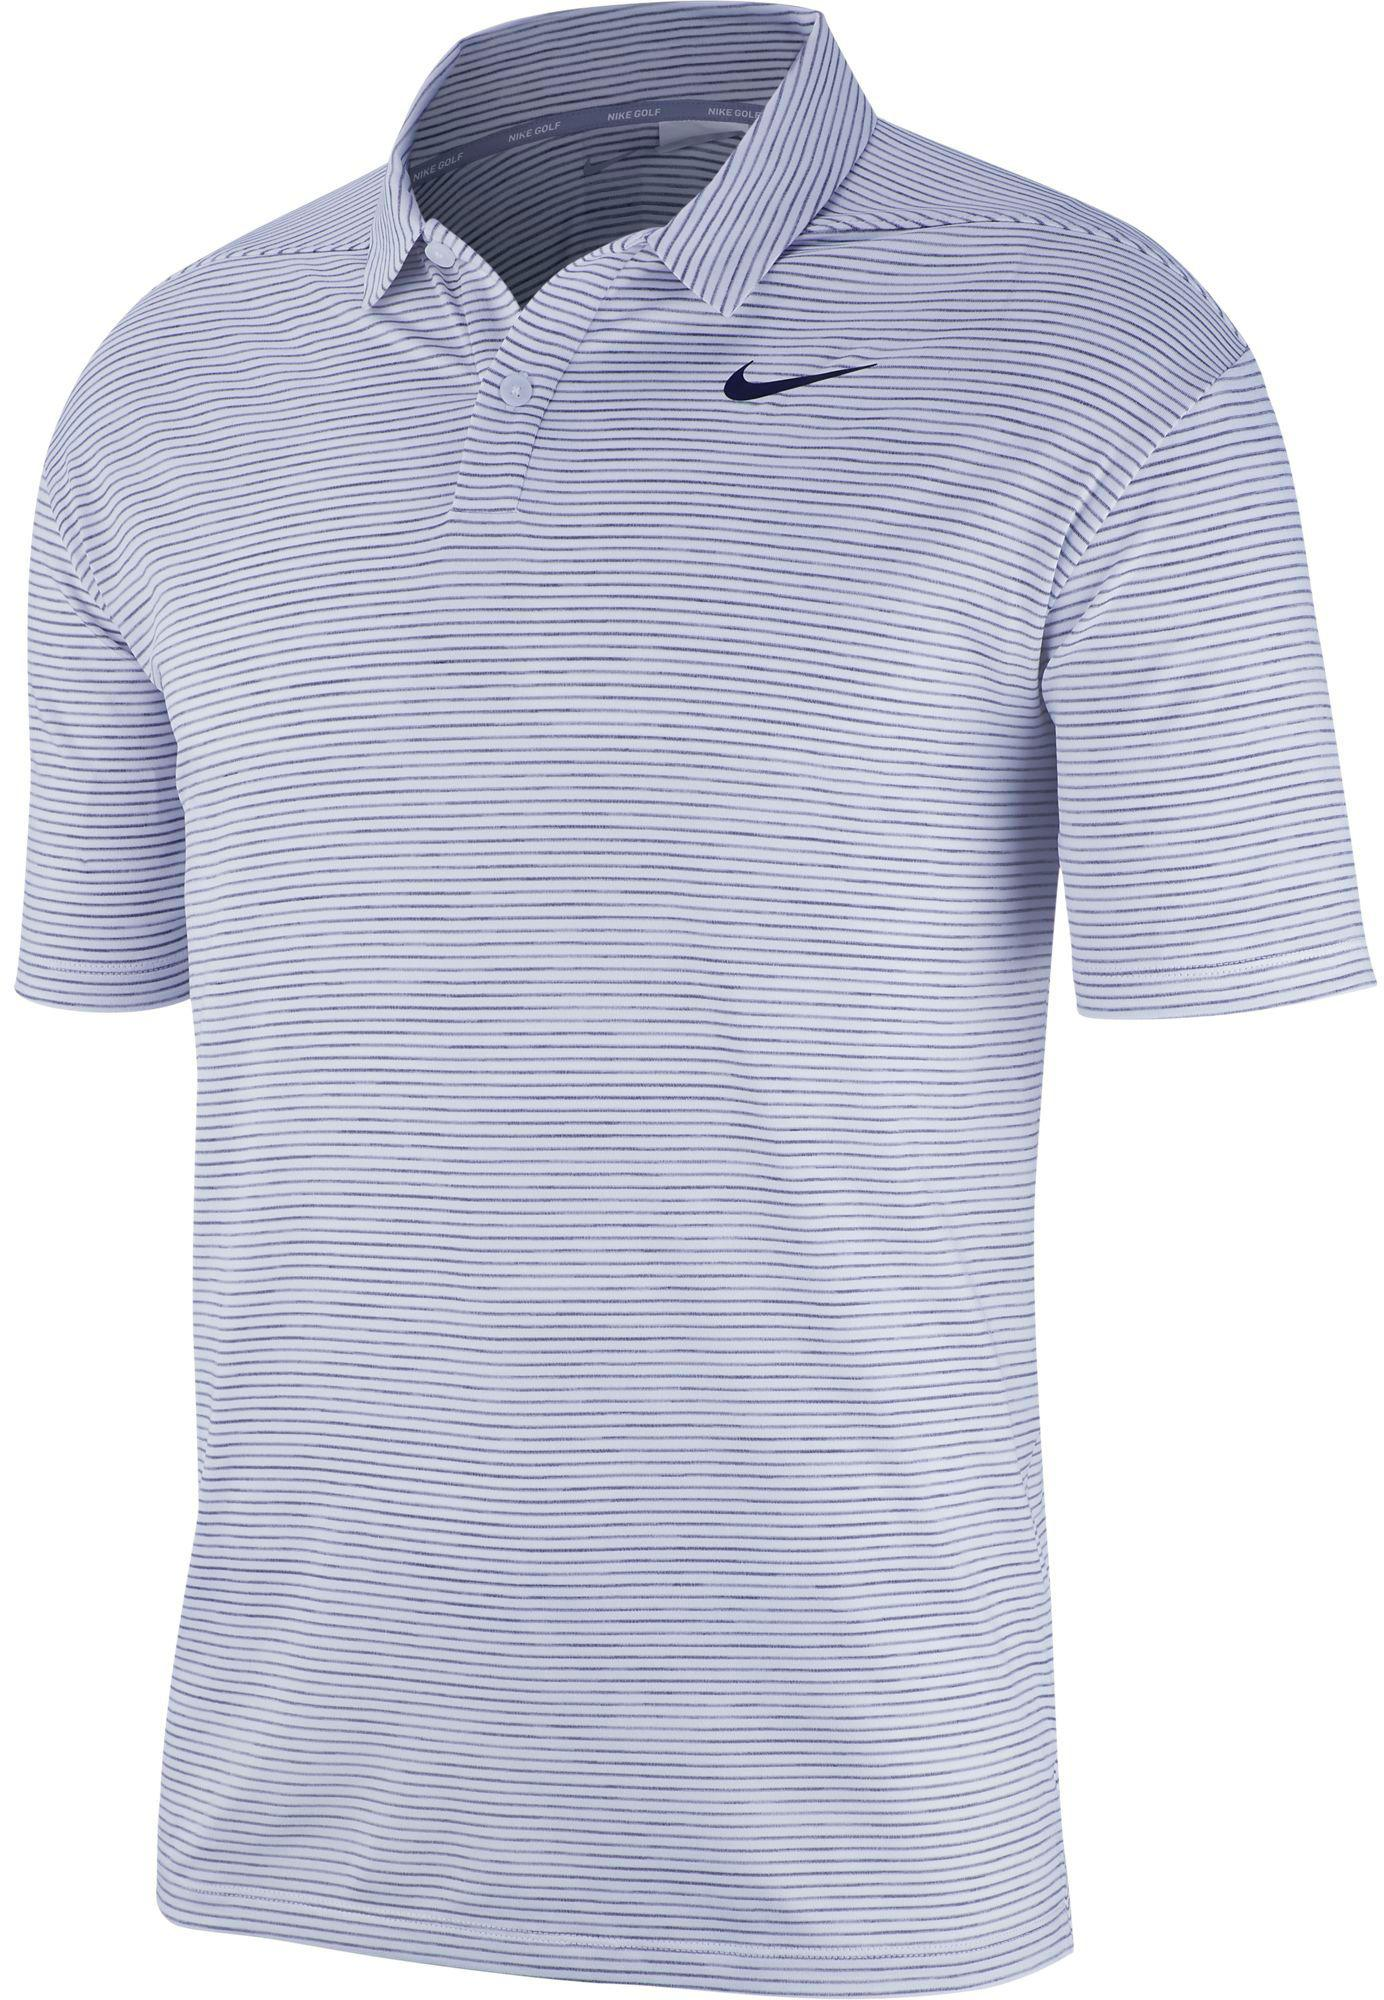 58a4346e Tiger Woods New Nike Golf Shirts - DREAMWORKS